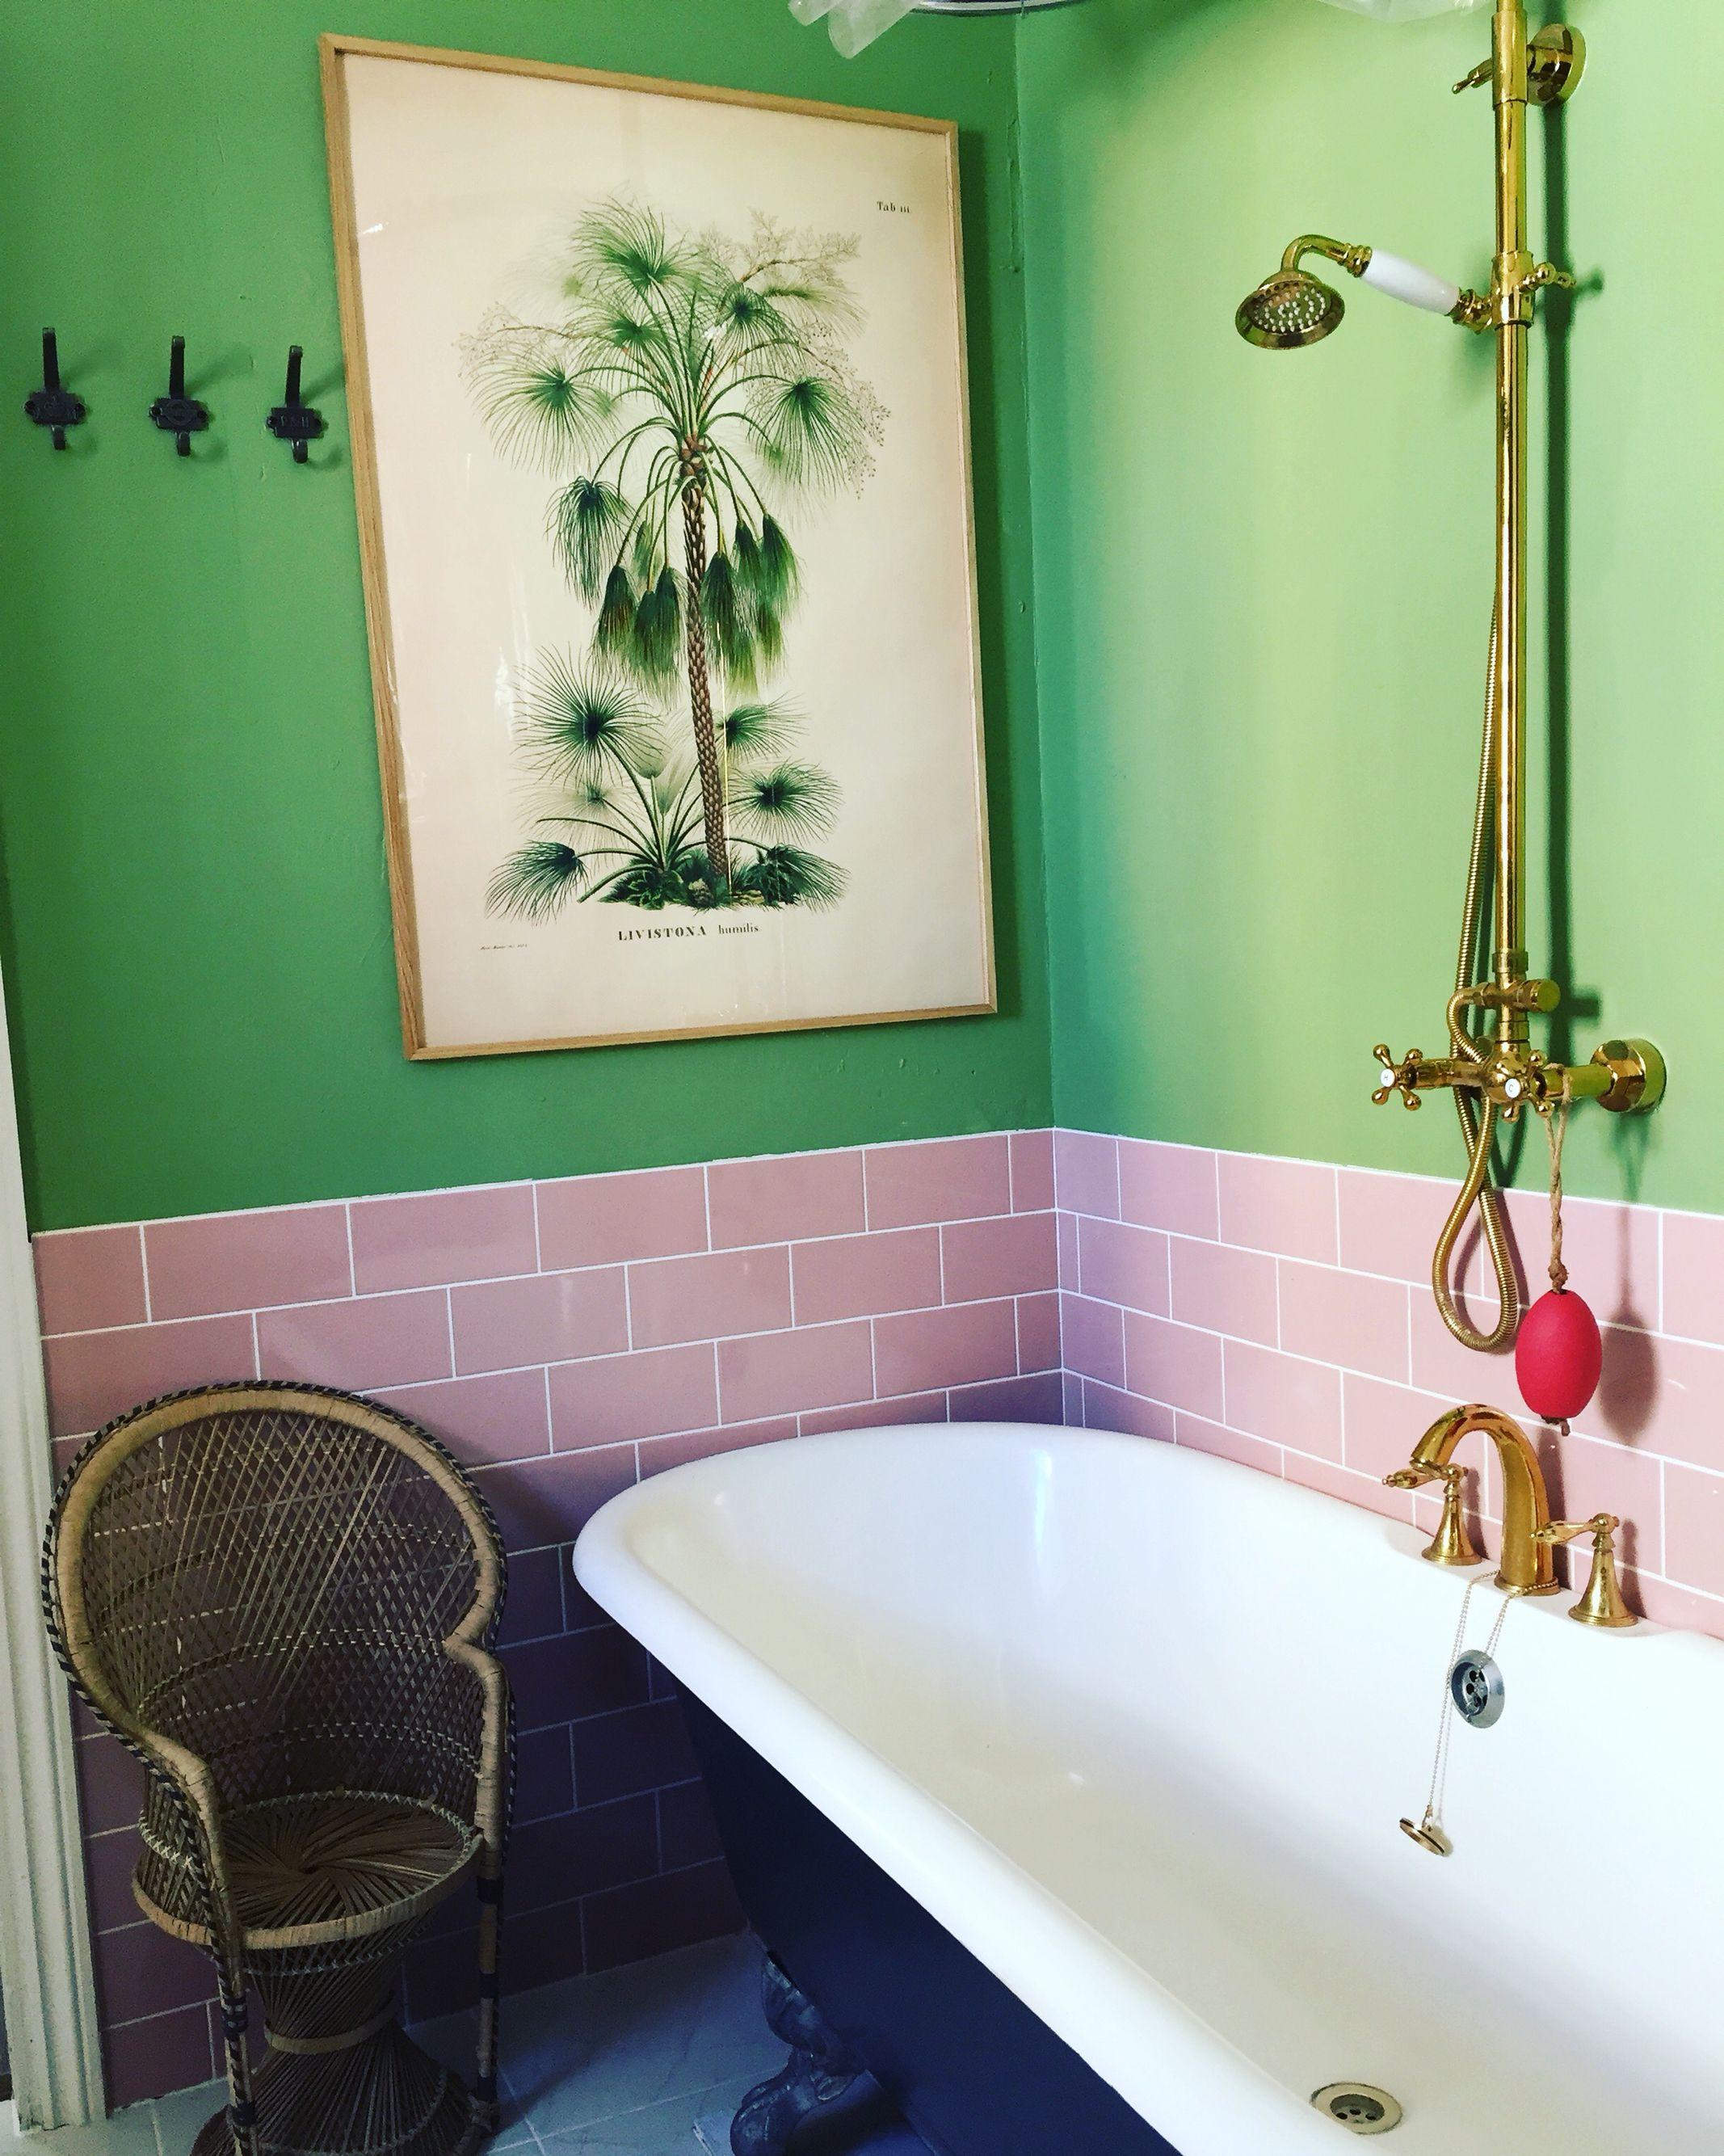 Pin By Lynn Johnstone On 1950 S Bathrooms Retro Bathrooms Retro Pink Bathroom Vintage Bathrooms